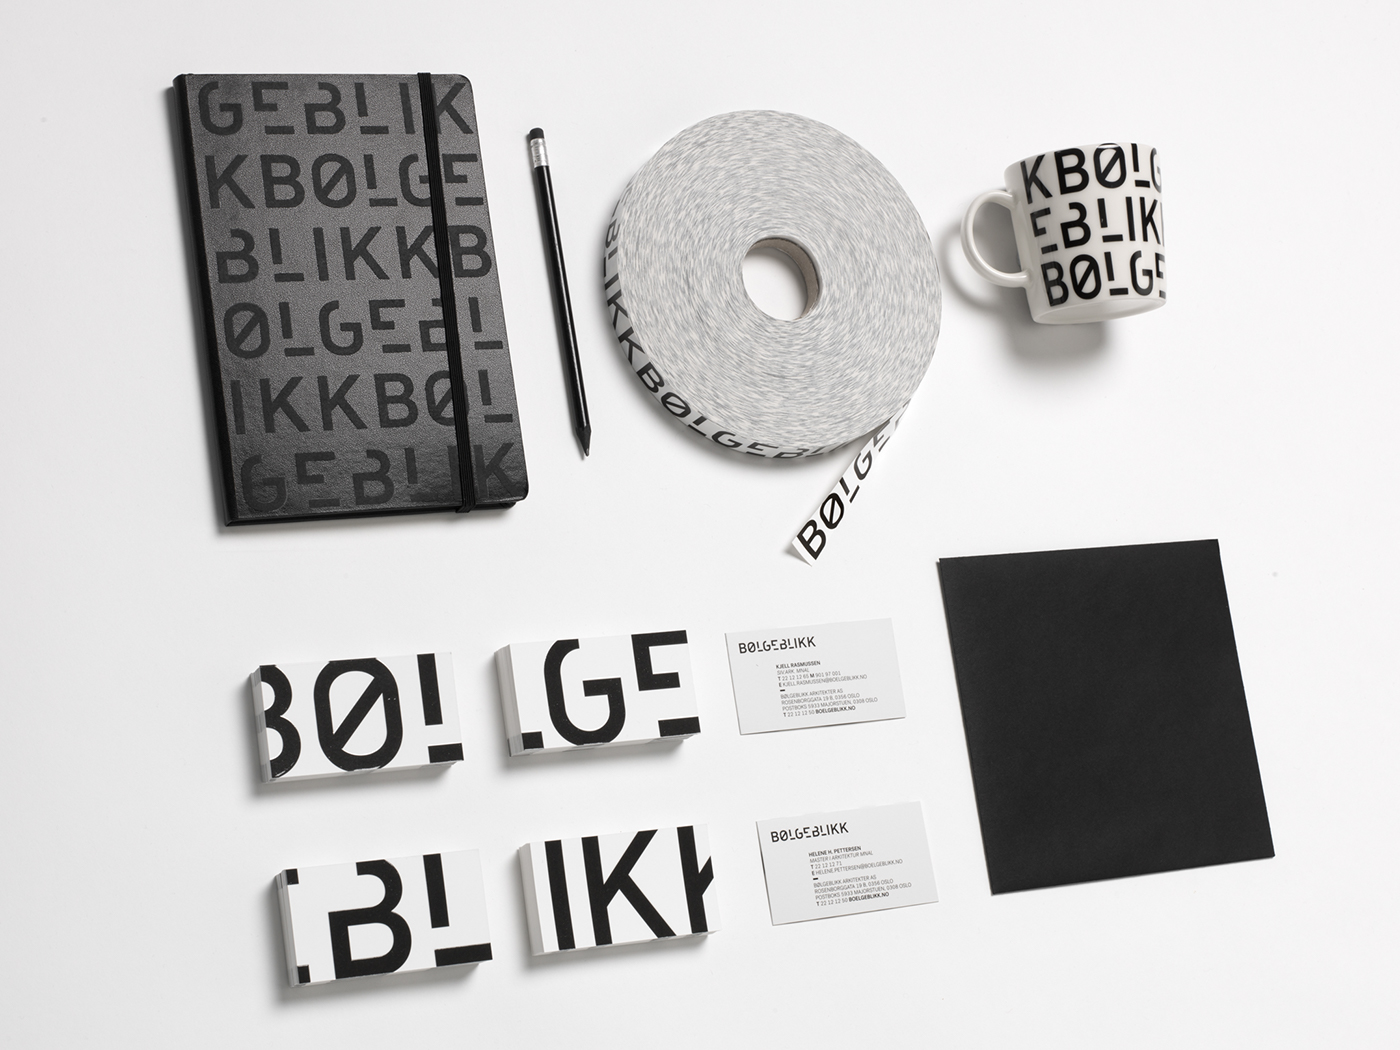 bolgeblikk-visual-identity-tank-design-05